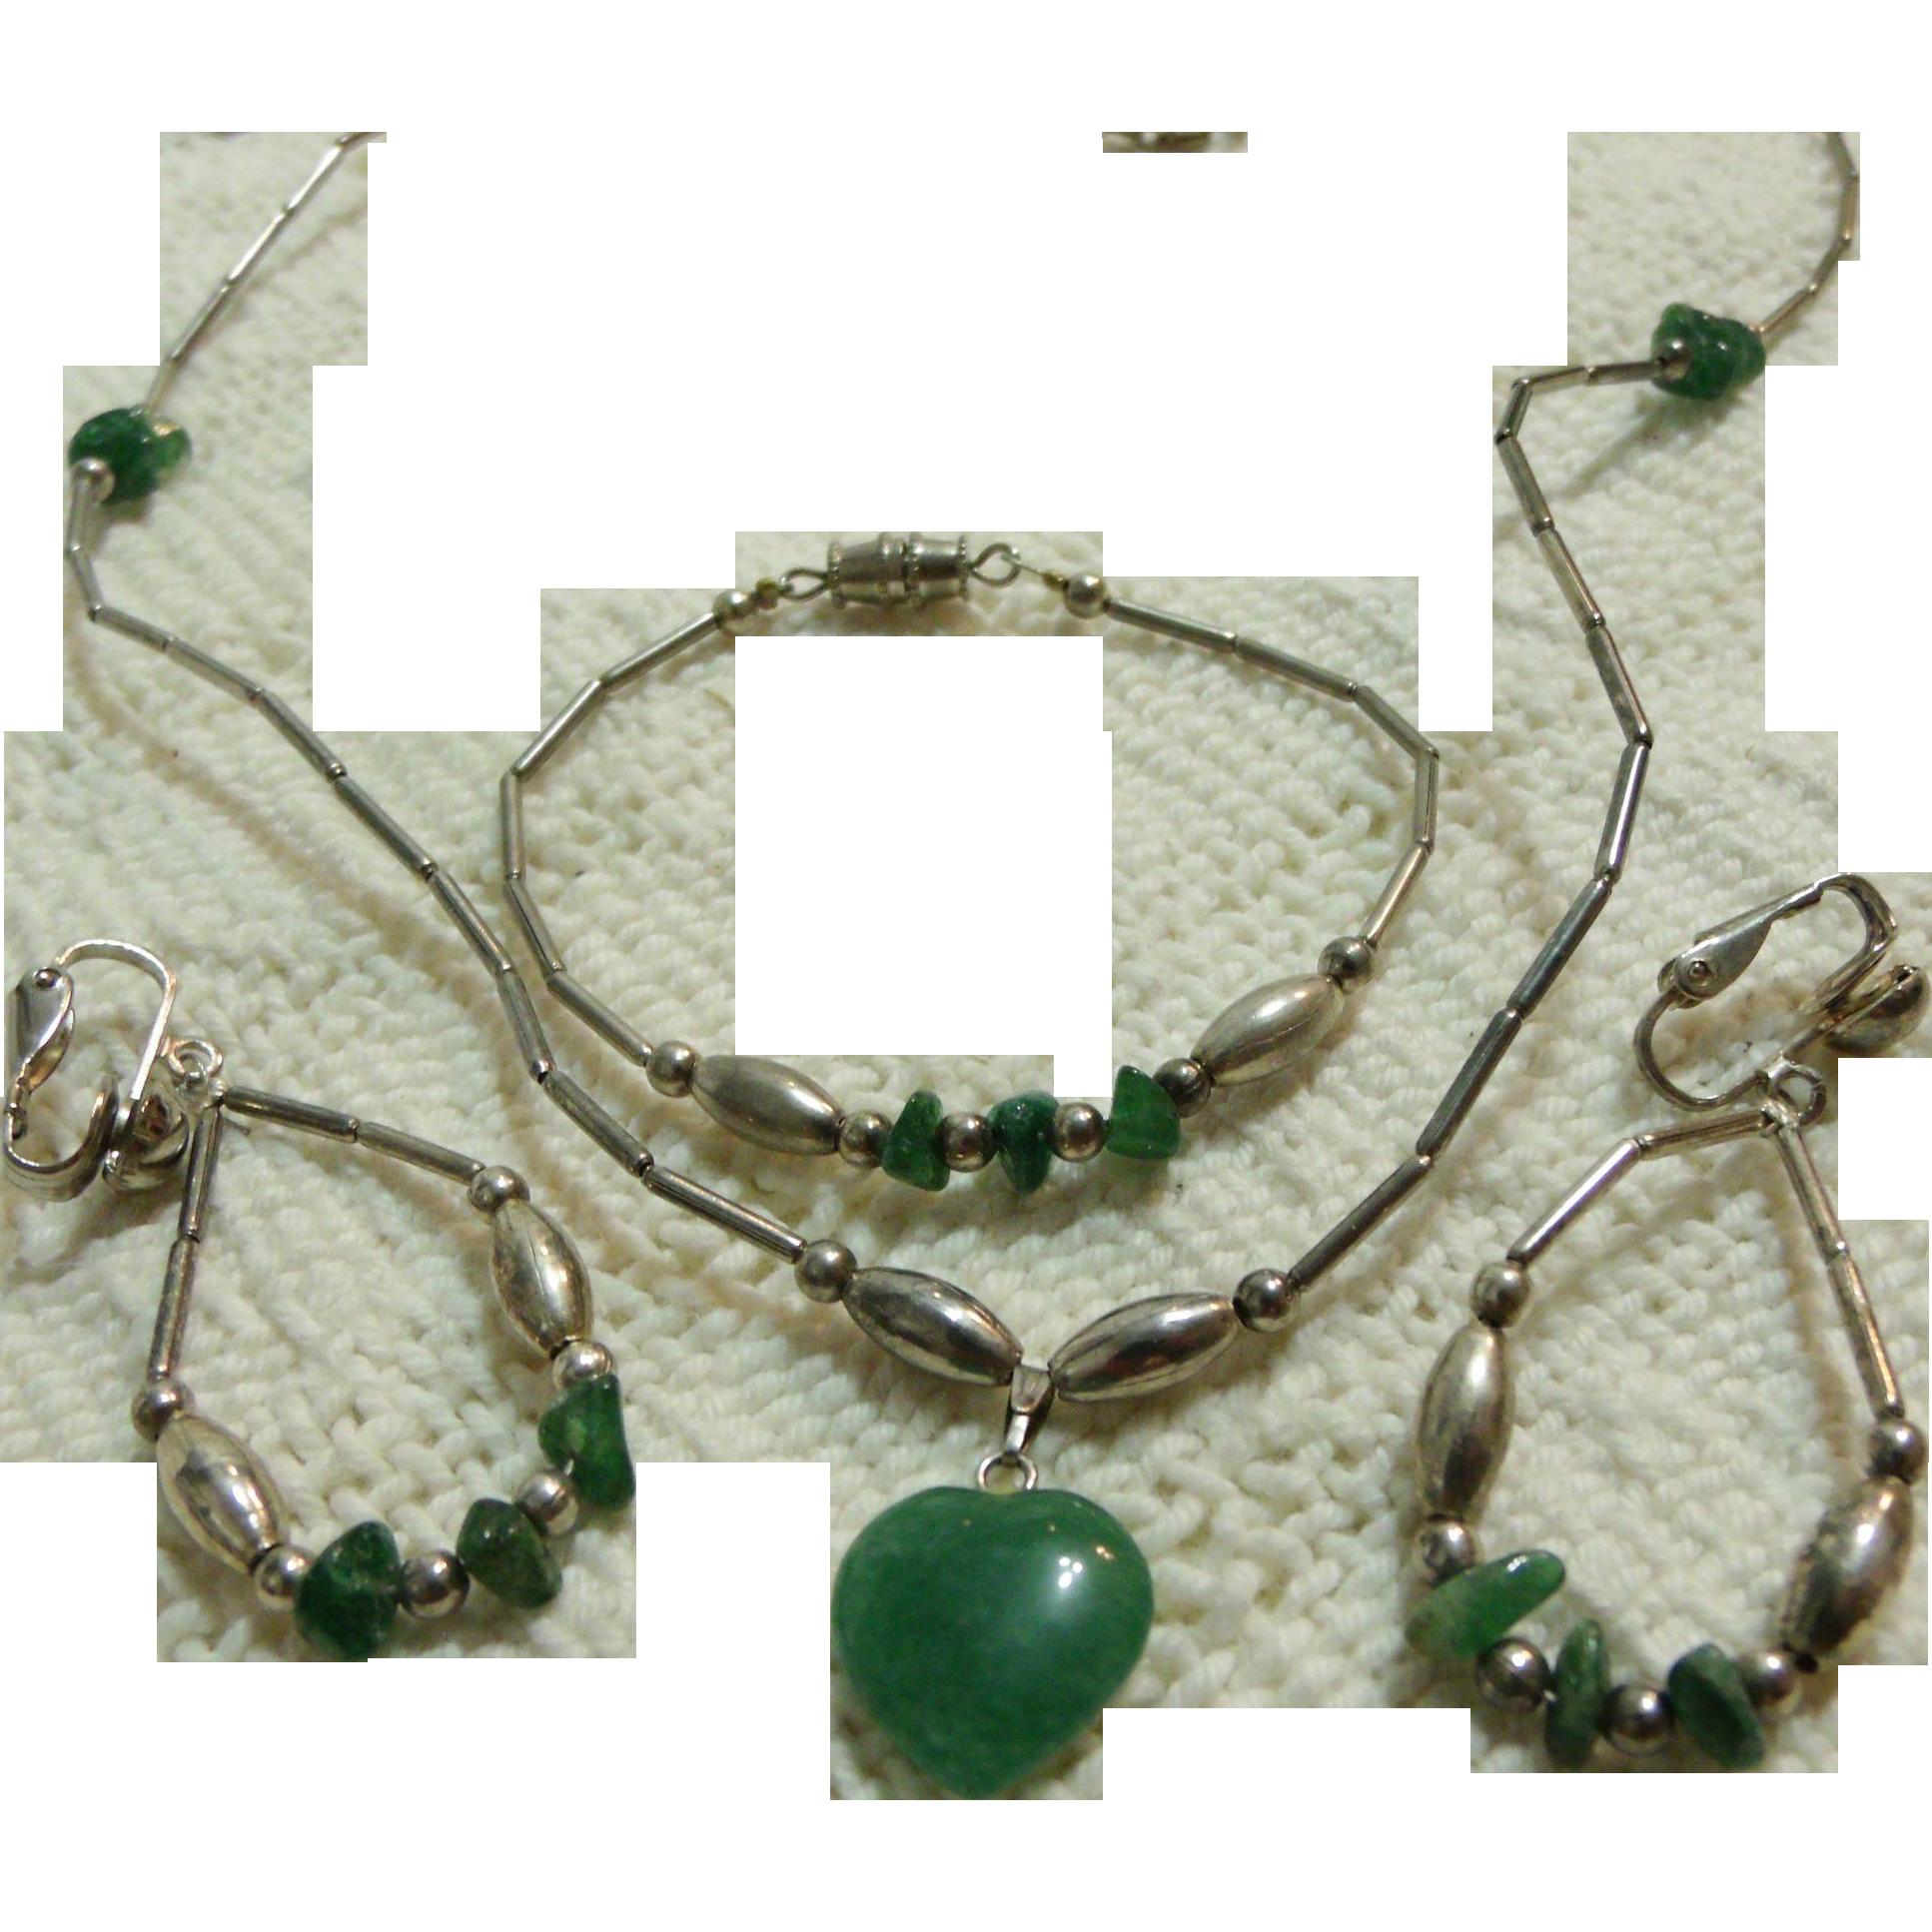 Native American Parure Silver-tone & Green Jade Necklace Earrings Bracelet Set